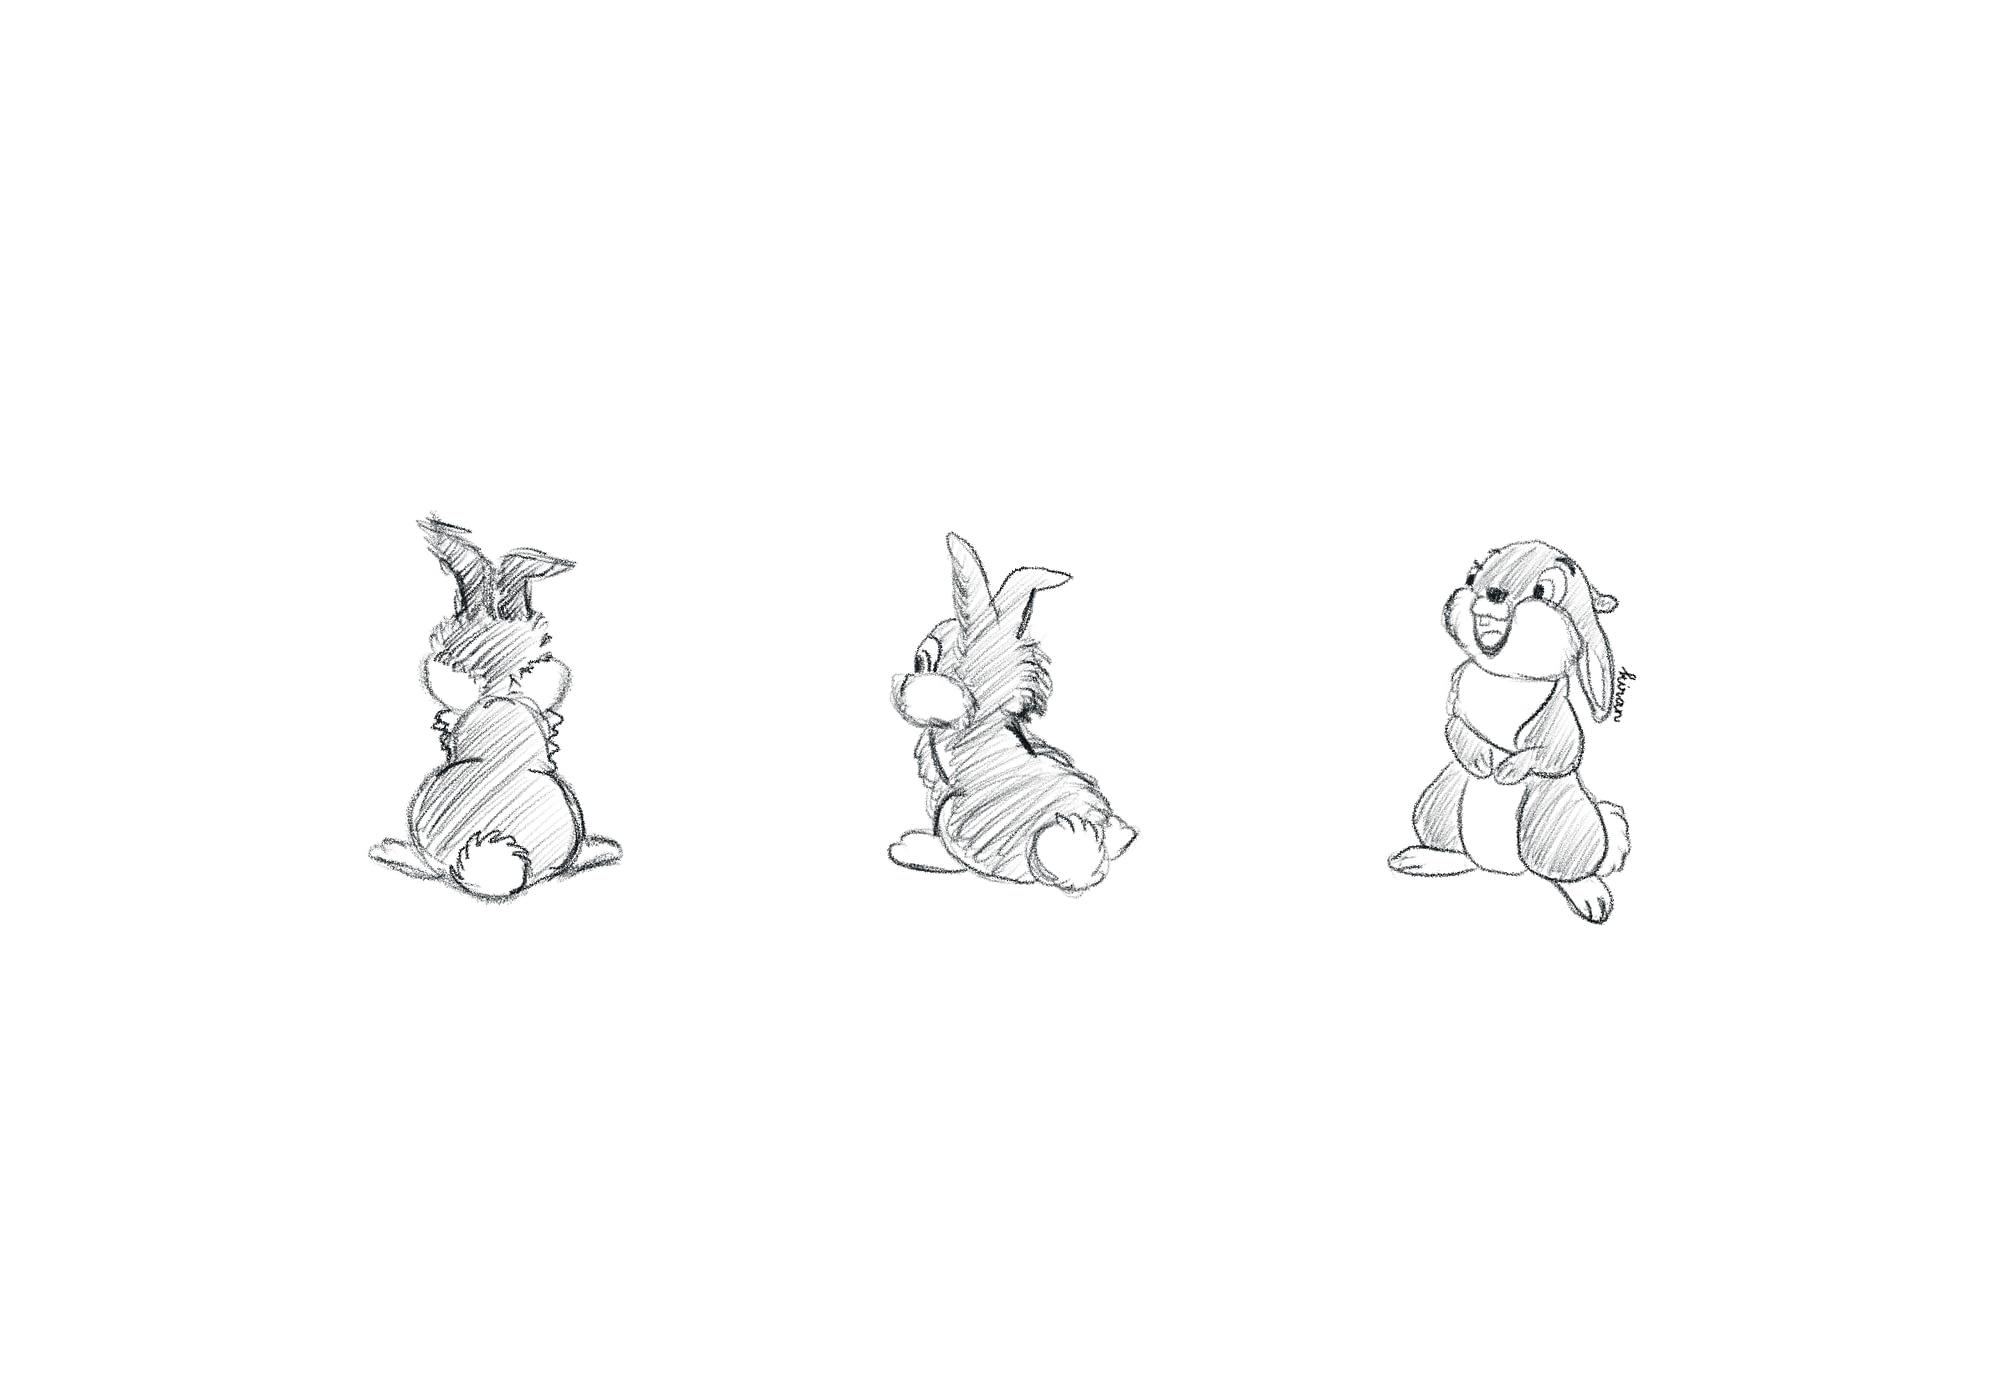 thumbnail-sketching-disney-thumper